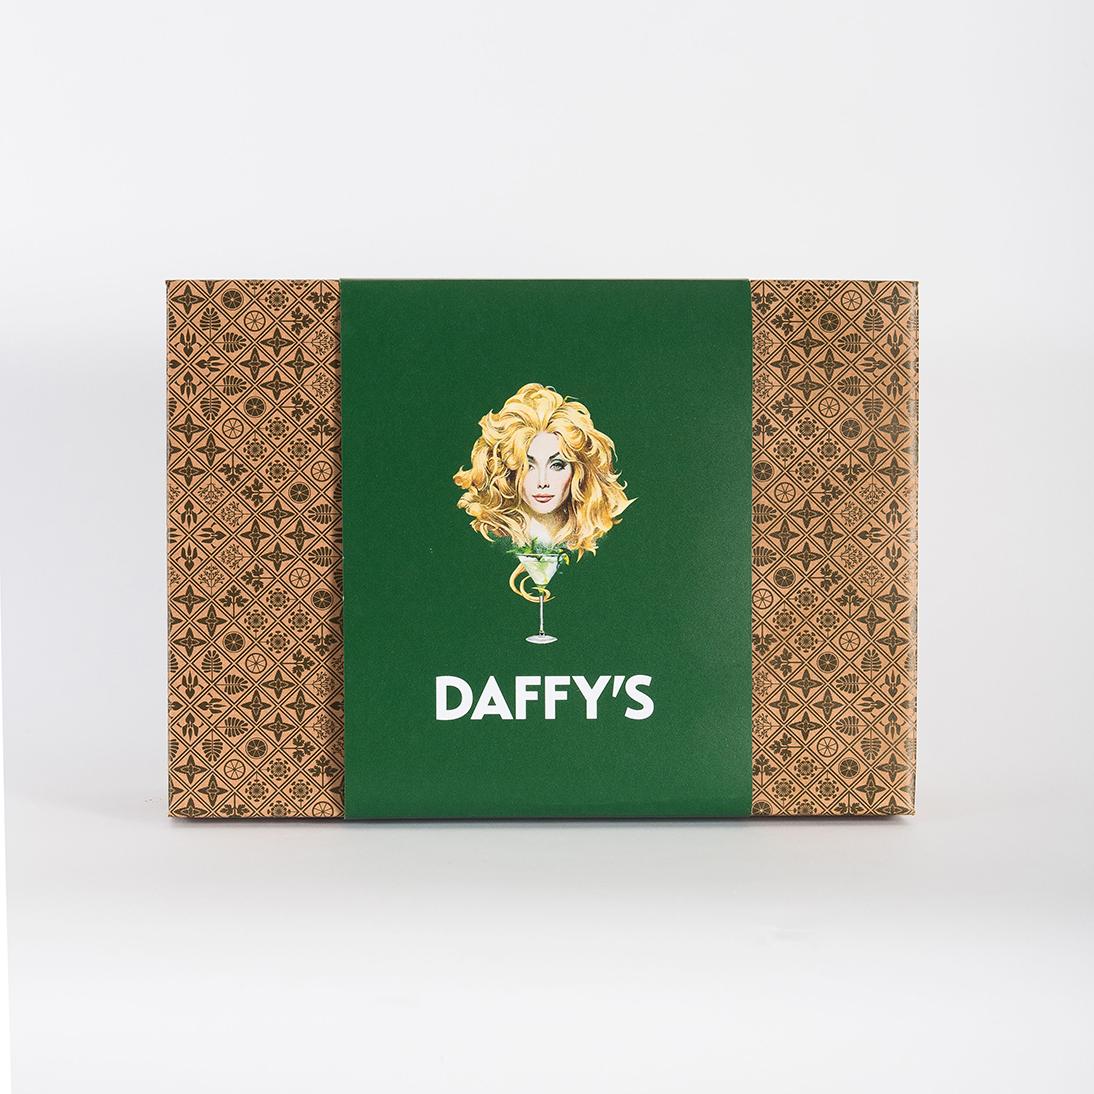 Daffy's gin gift box